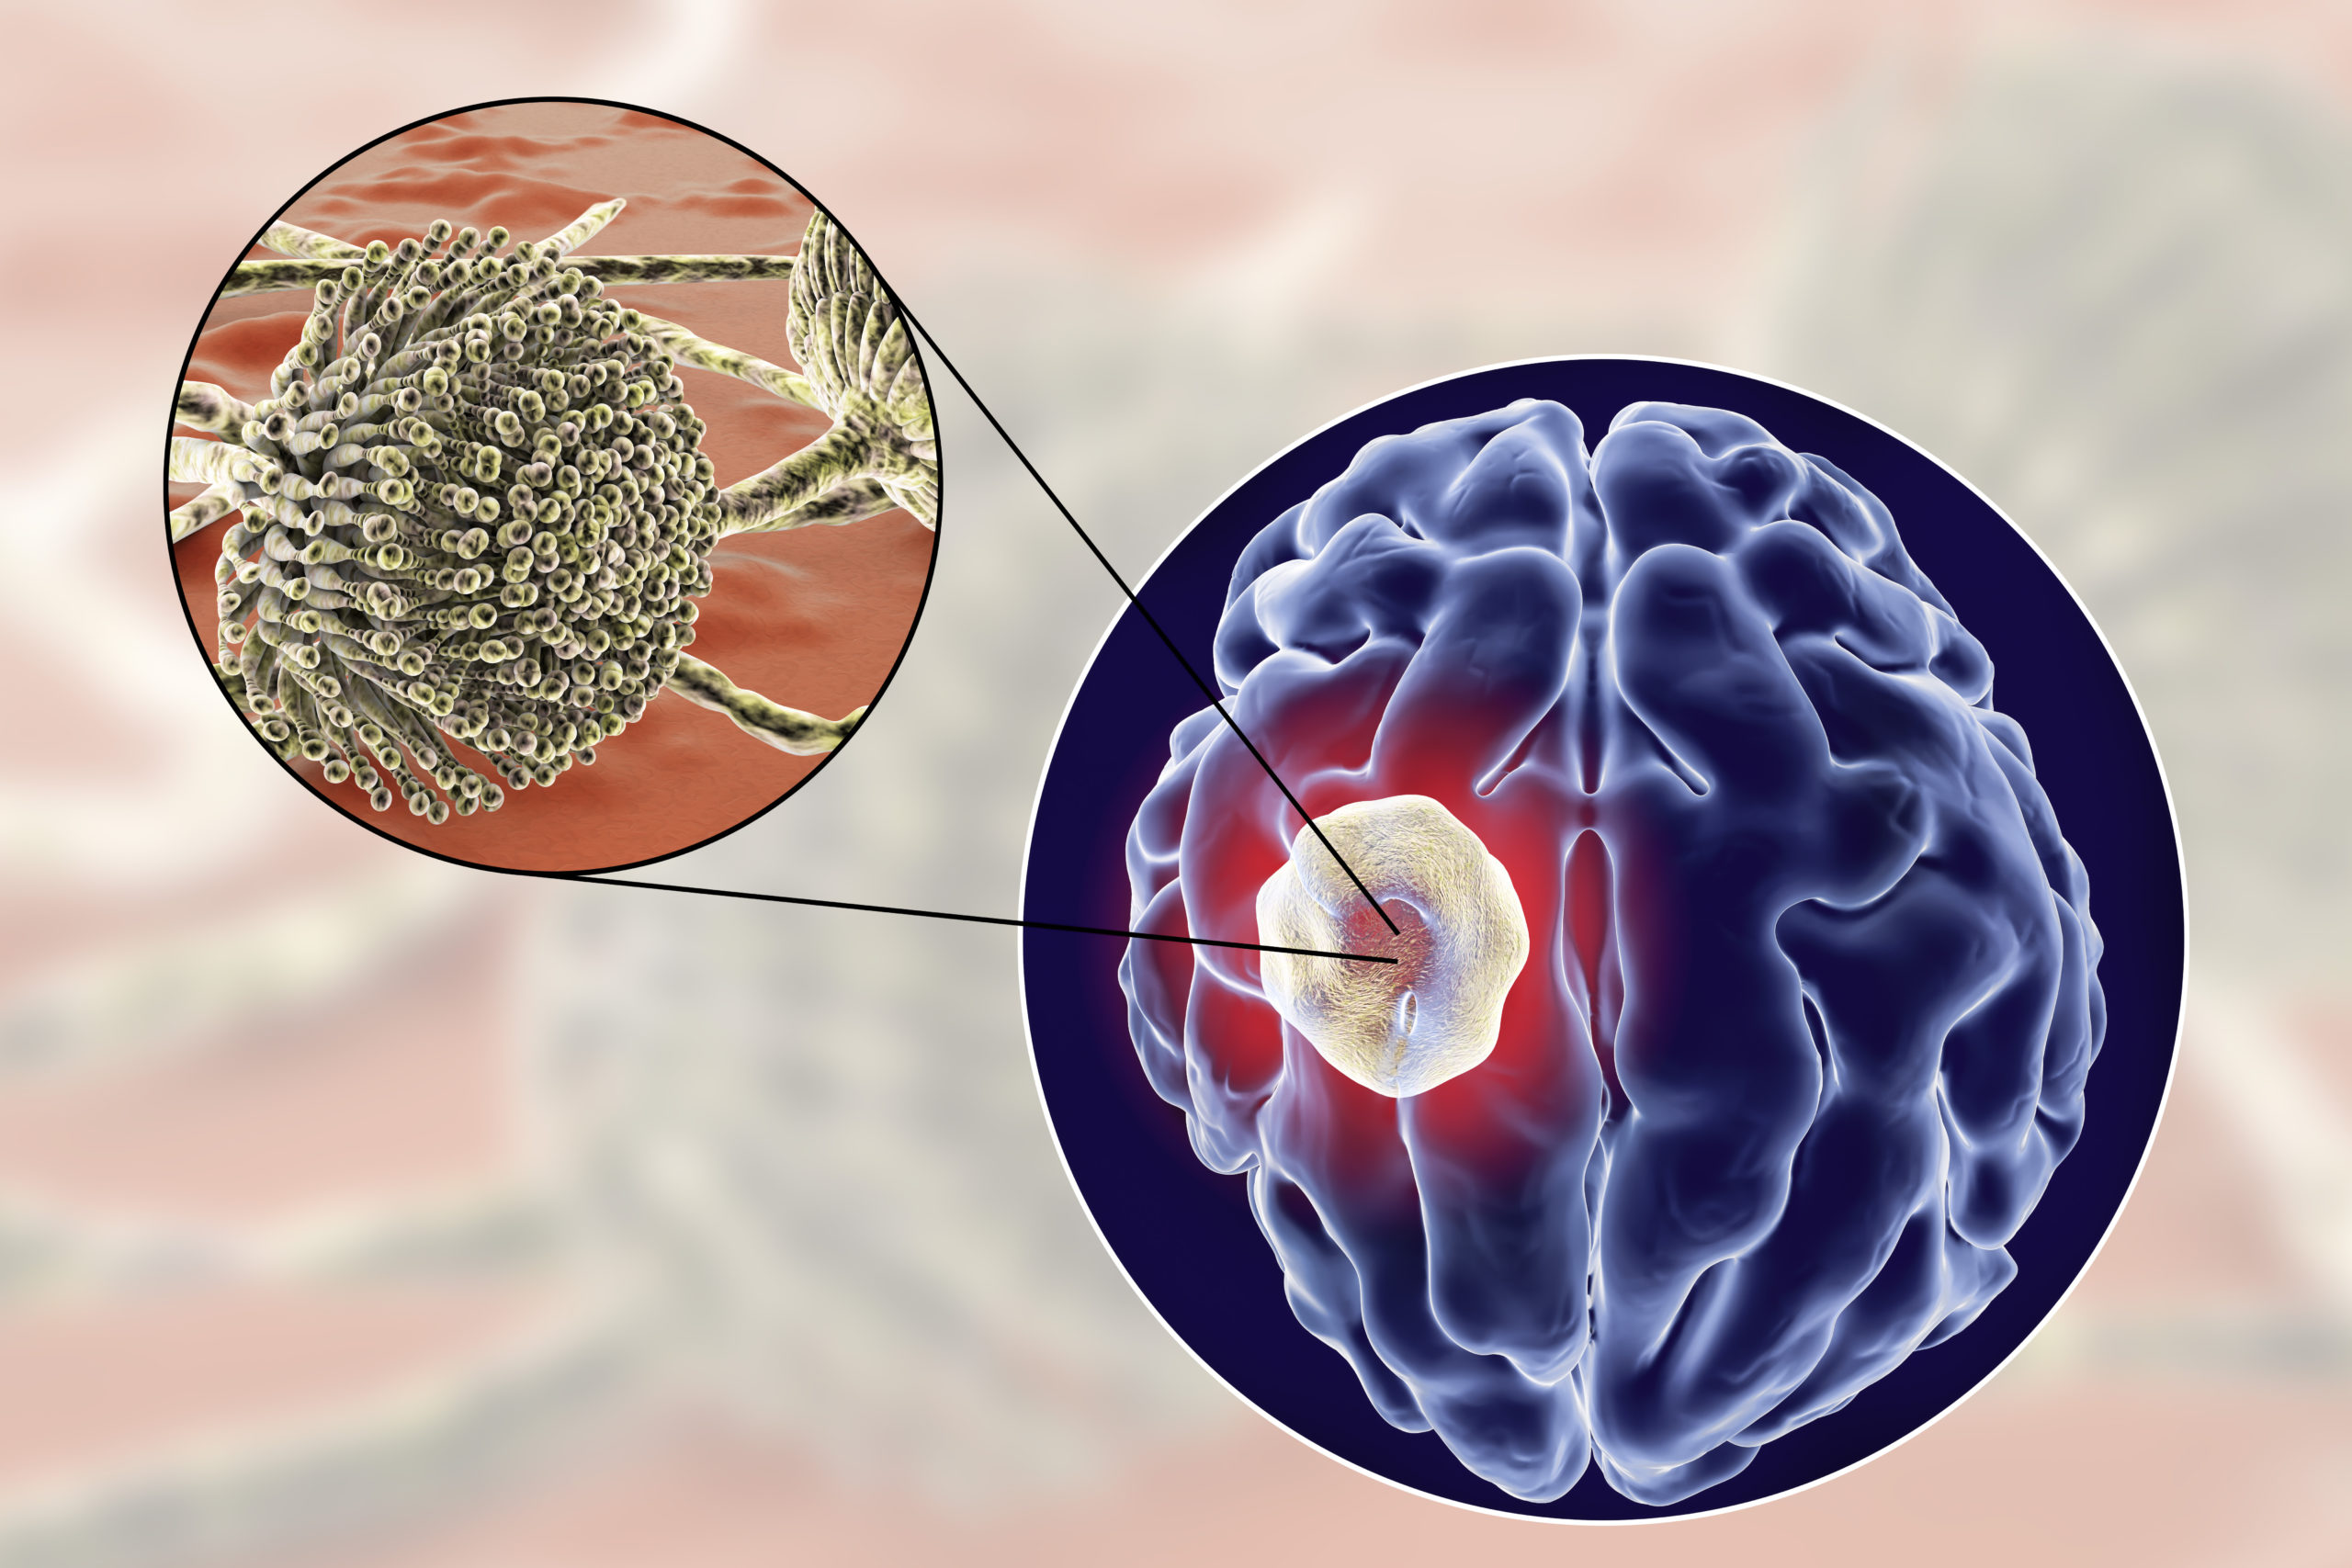 Aspergilloma of the brain and close-up view of fungi Aspergillus